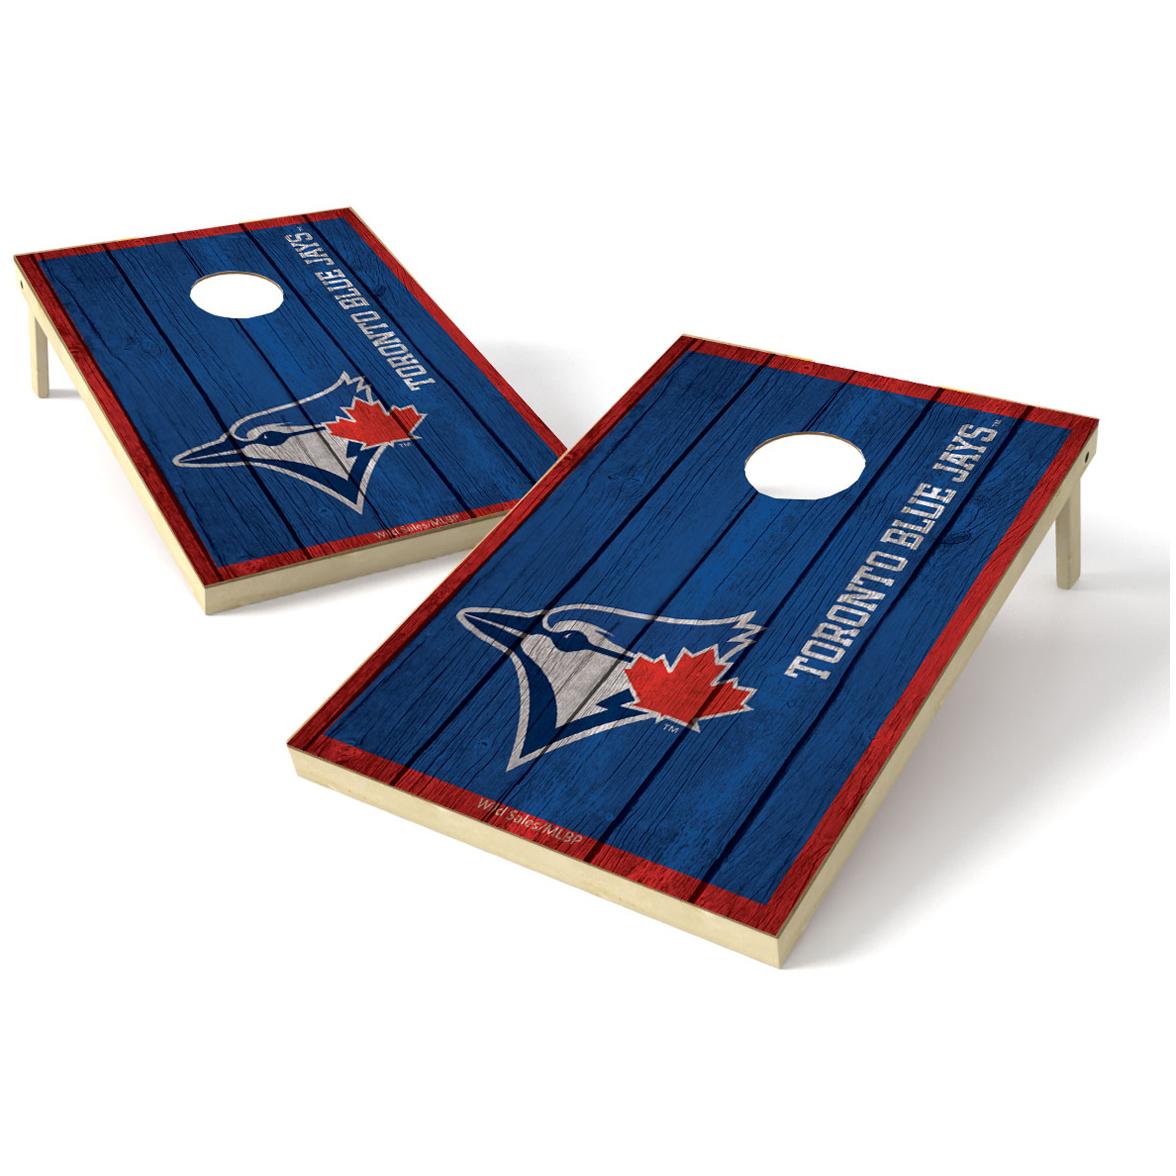 2X3 Shield Game MLB Big Vintage Toronto Blue Jays